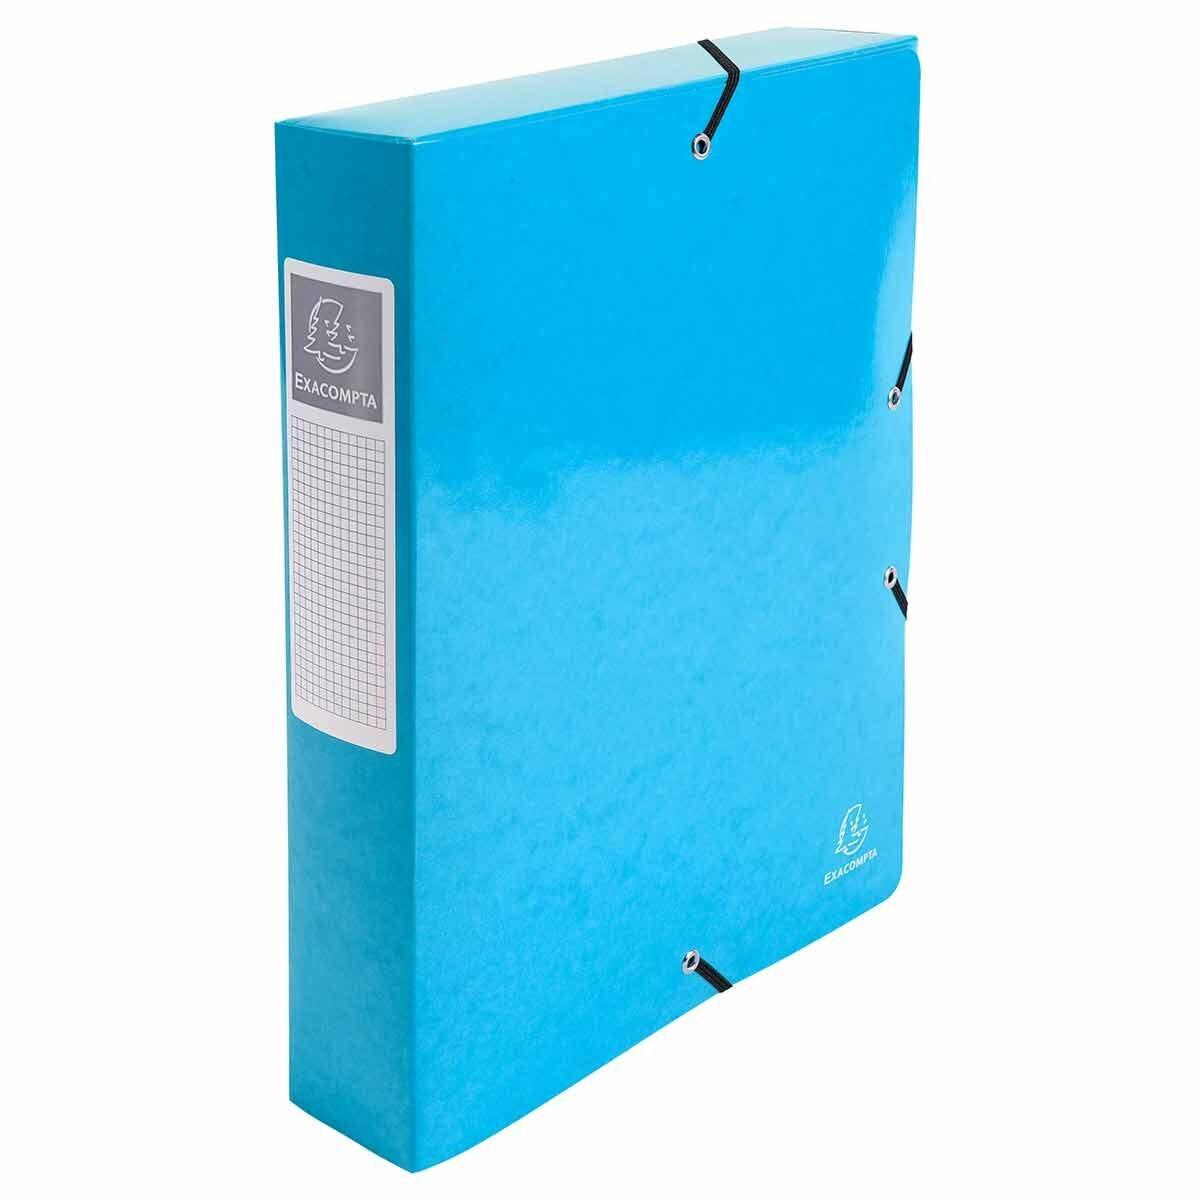 Exacompta Iderama Elasticated A4 Box File 60mm Pack of 8 Light Blue